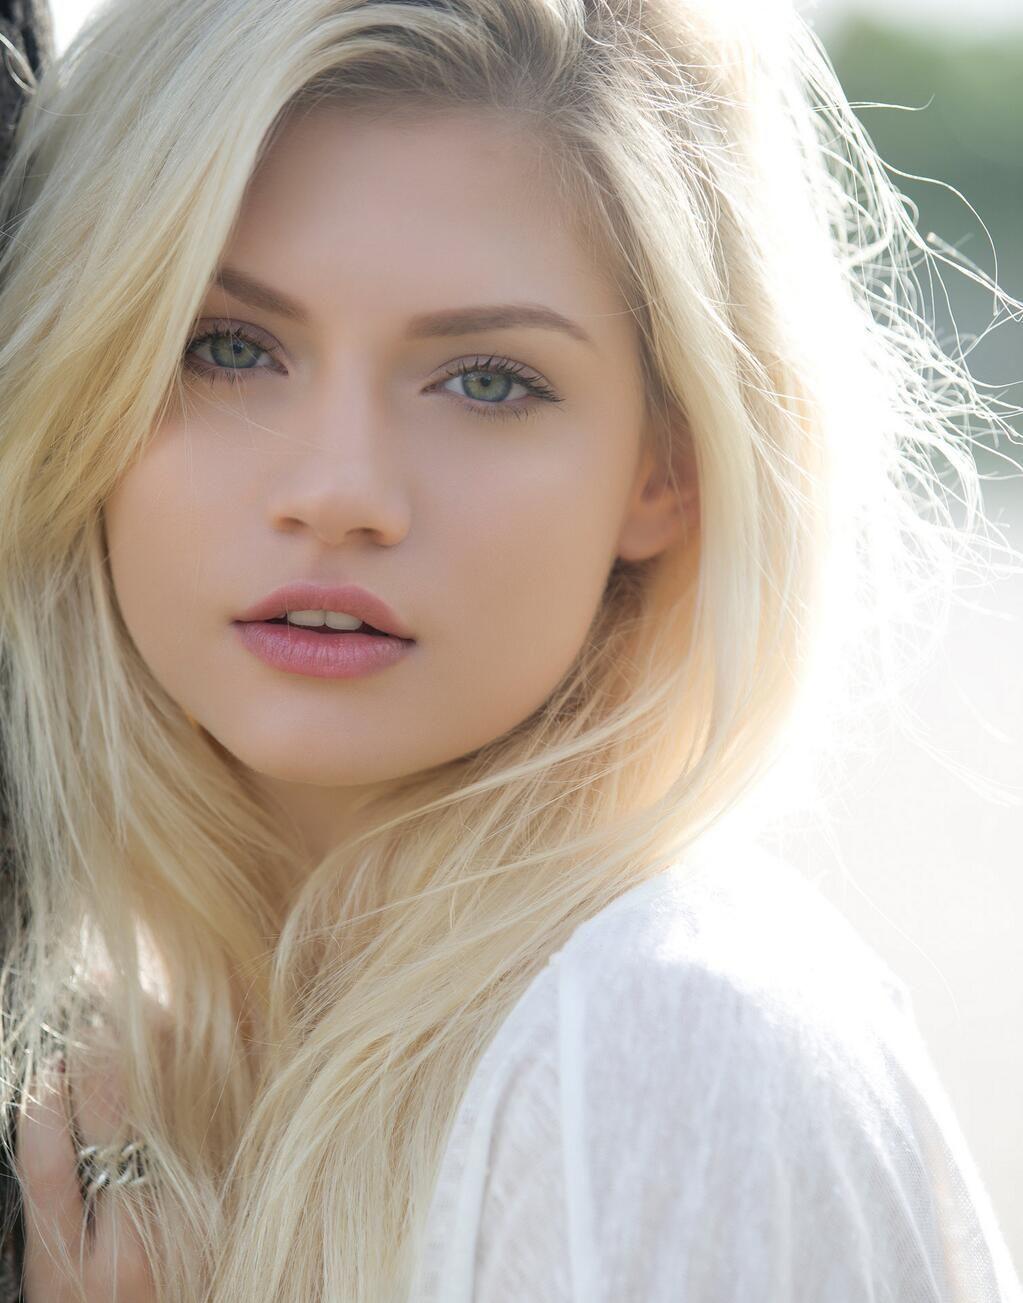 Znalezione obrazy dla zapytania beauty blonde girl